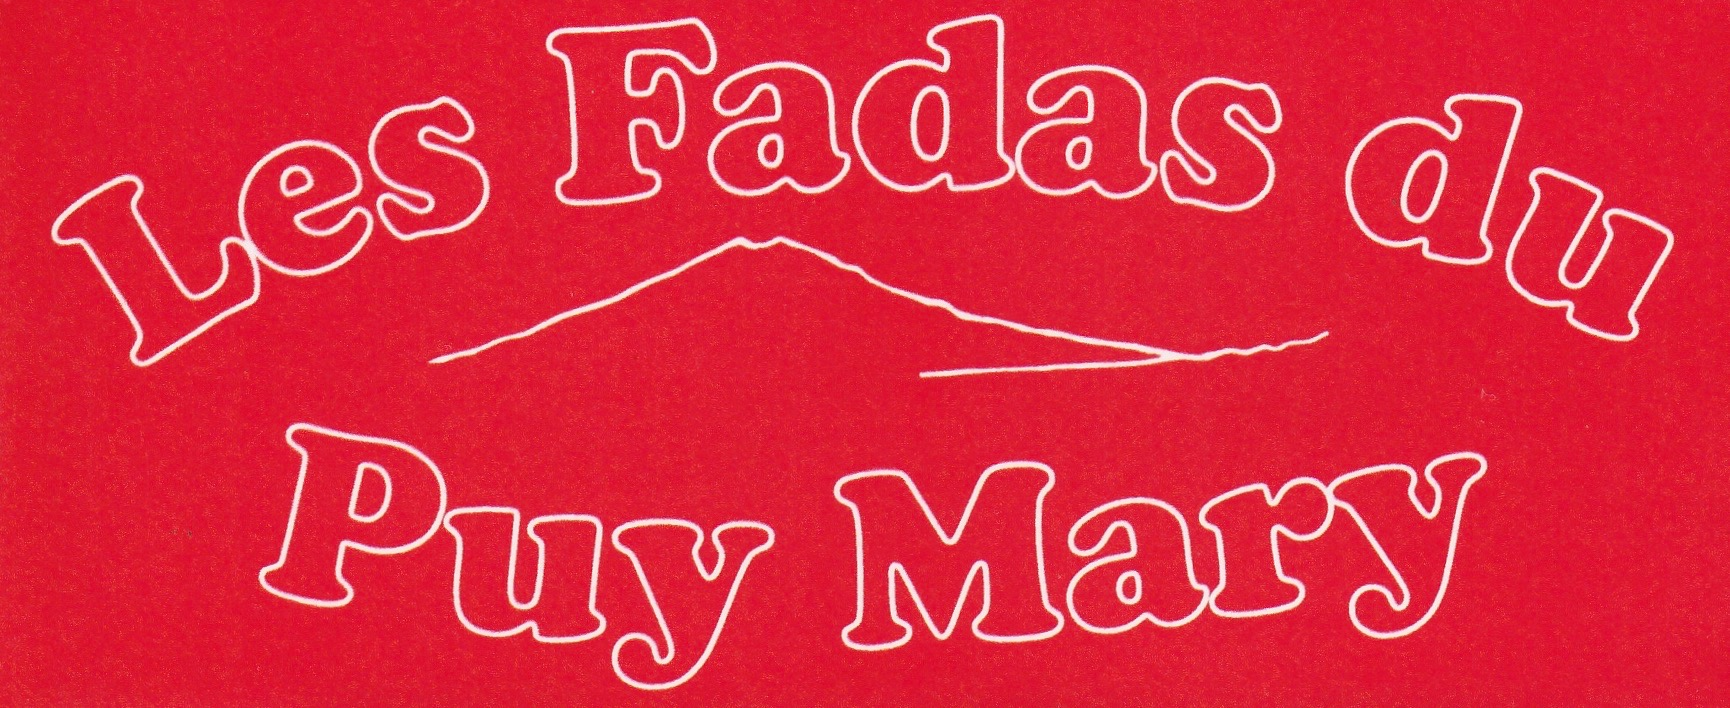 Logo Les Fadas du Puy Mary _1_.jpg